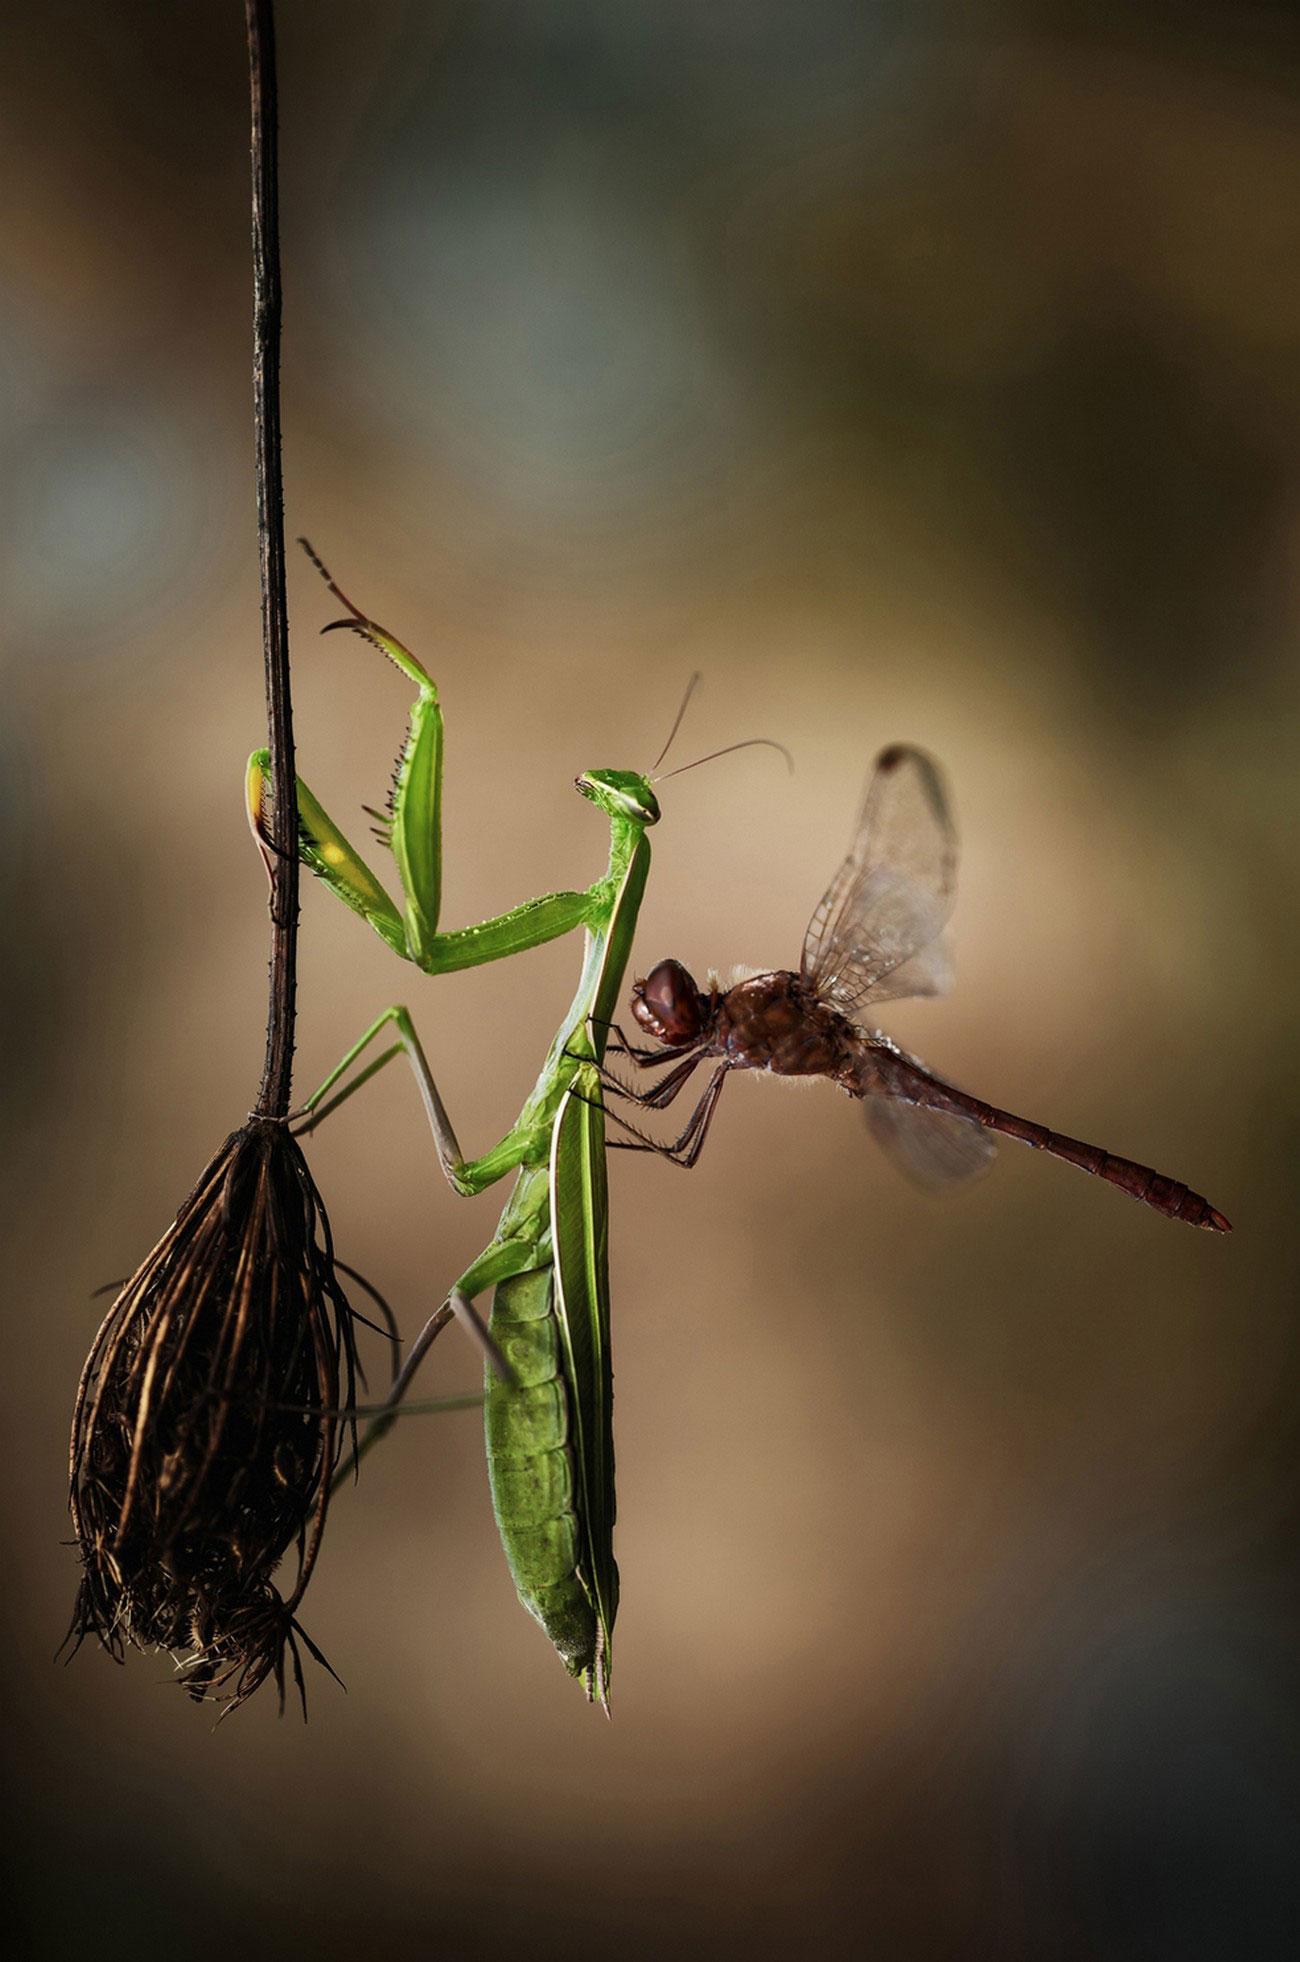 богомол и стрекоза, фото National Geographic